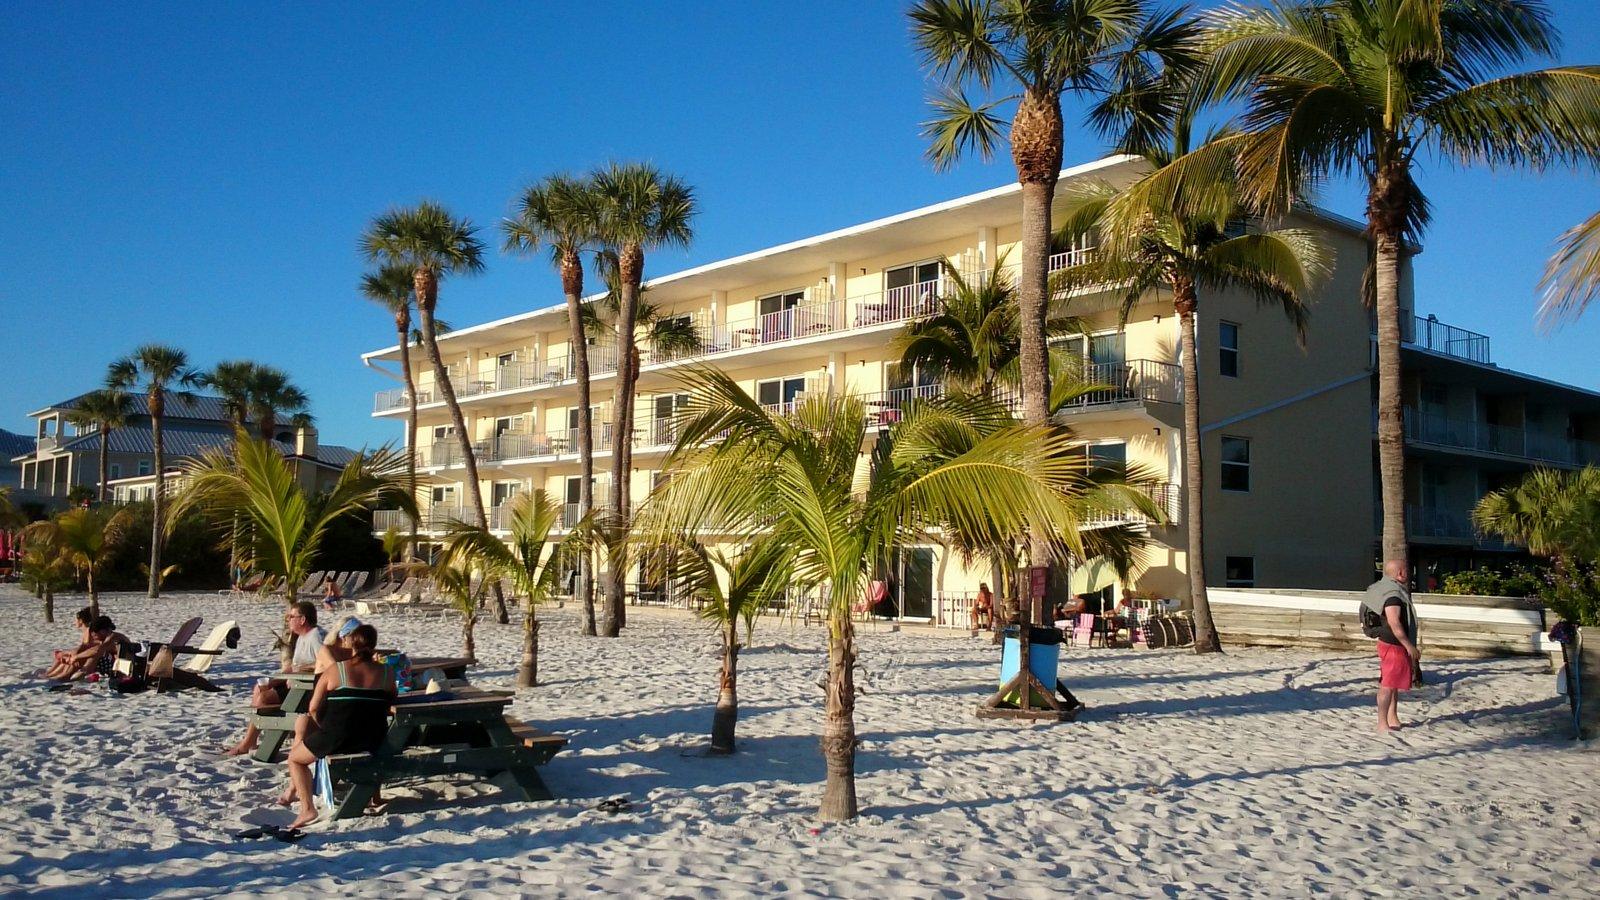 Outrigger Beach Resort Fort Myers Beach Florida